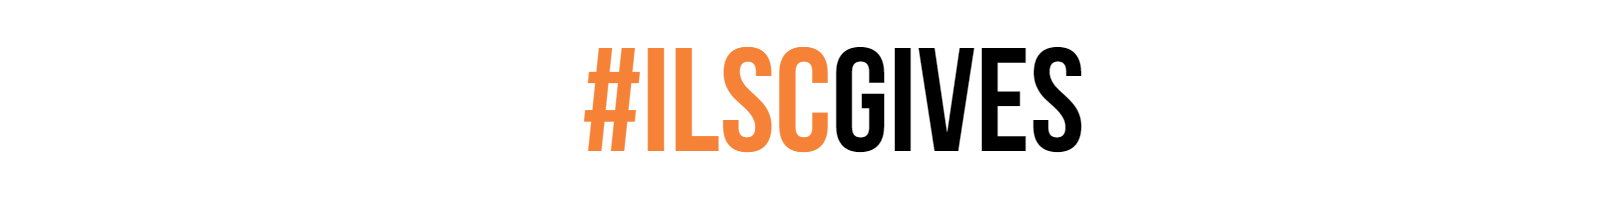 #ilscgives social media feed